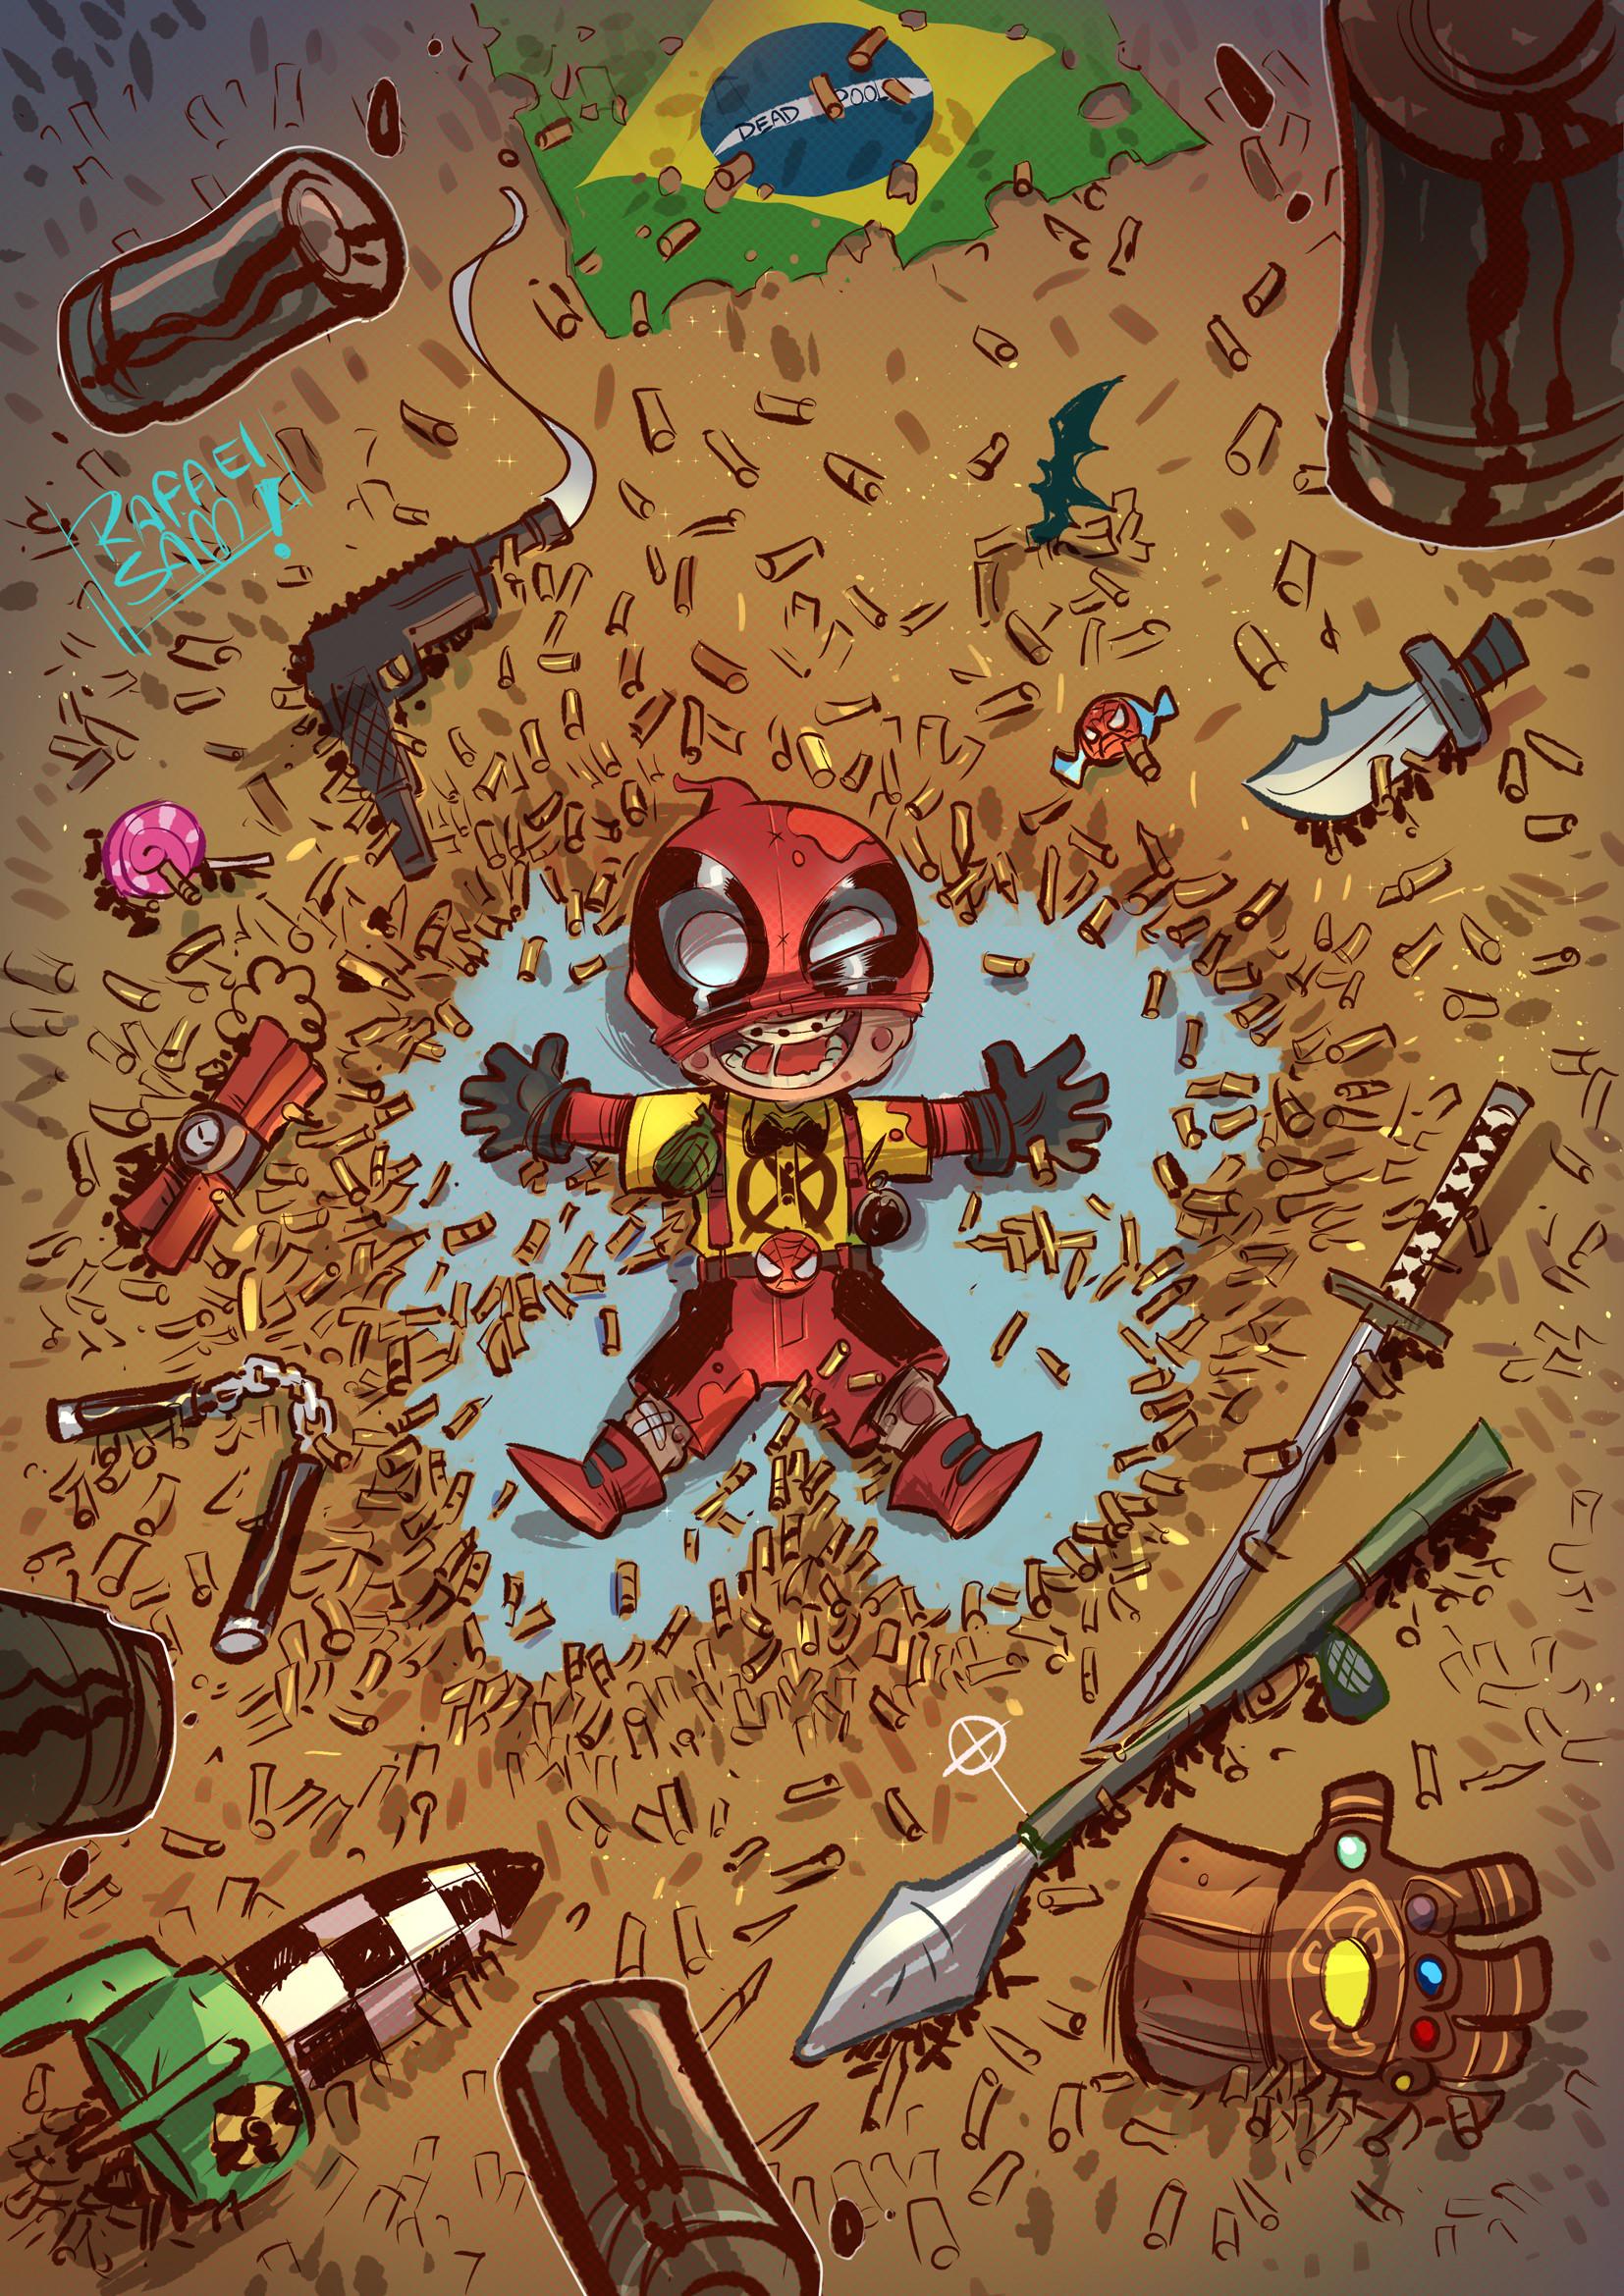 General 1654x2339 Rafael Sam illustration Marvel Comics Deadpool children gun rocket launchers gloves bullet Skottie Young